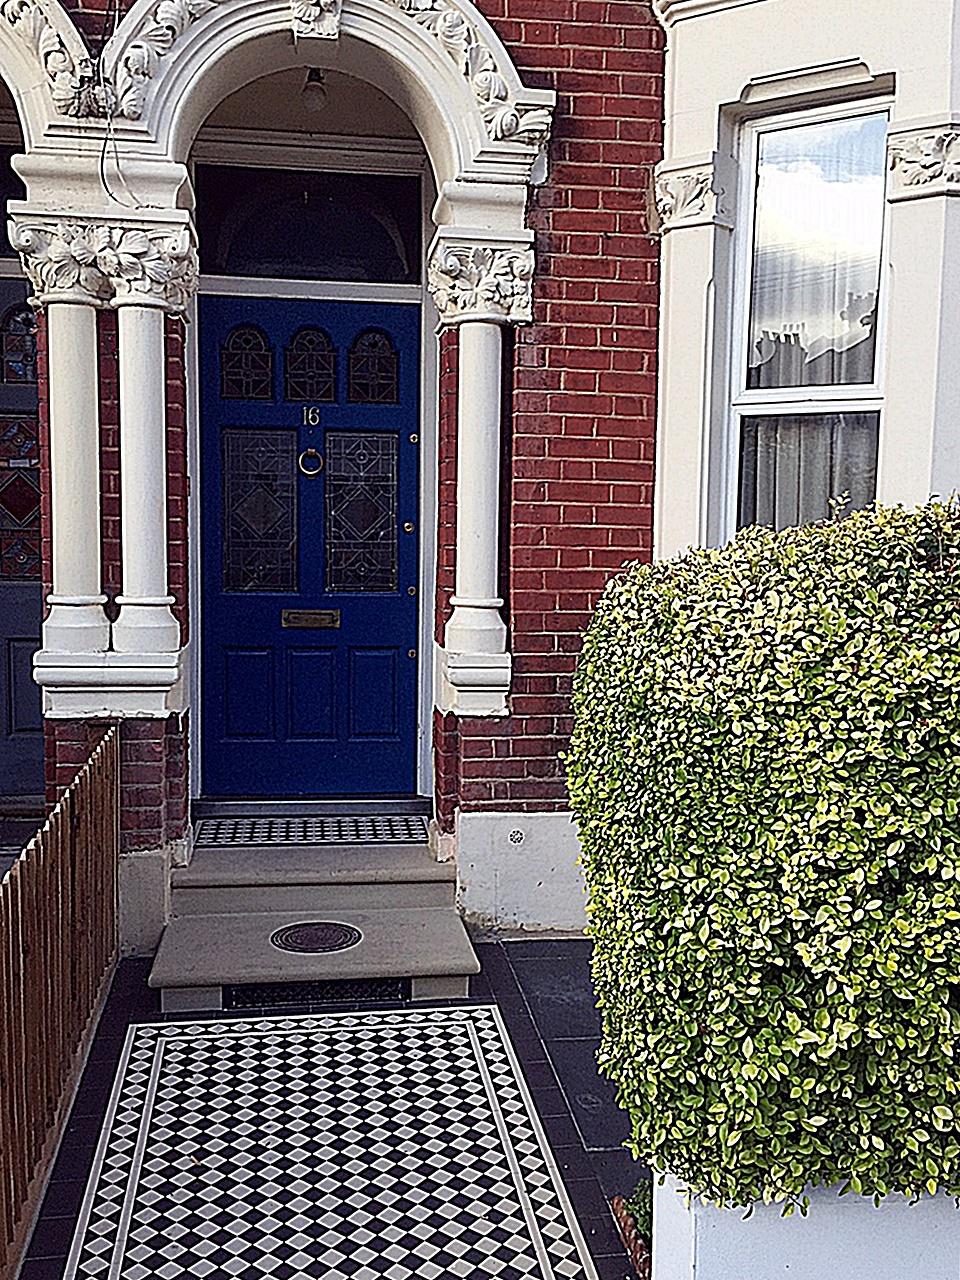 Victorian Mosaic path paving tile black and white London Clapham Balham Wandsworth